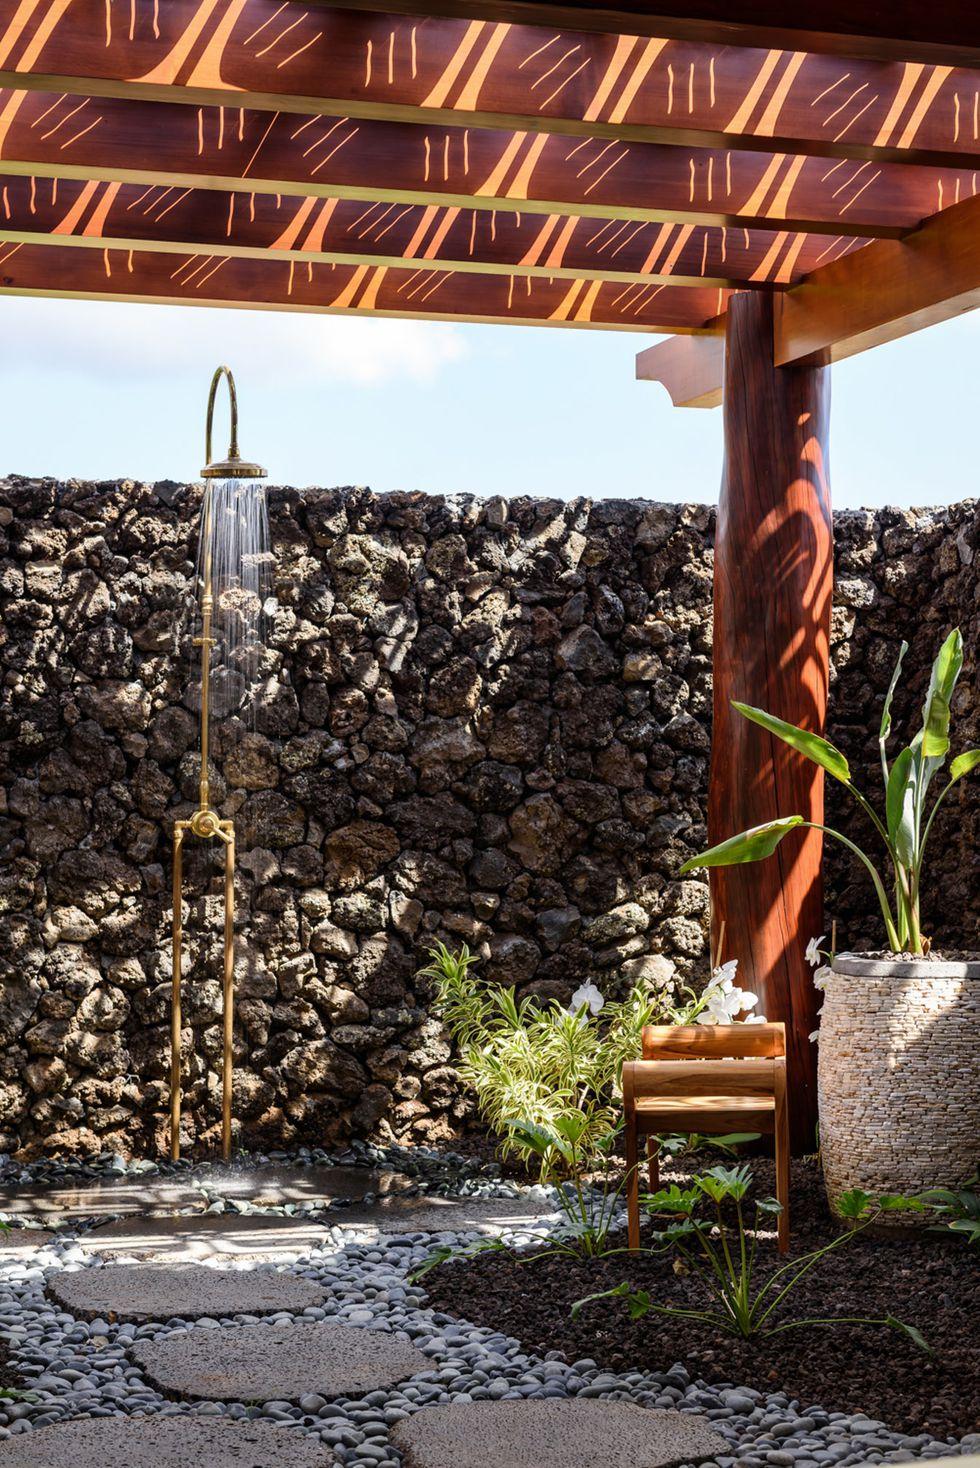 Luxury Outdoor Showers To Update Your Backyard 06 Luxury outdoor showers Luxury Outdoor Showers To Update Your Backyard Luxury Outdoor Showers To Update Your Backyard 06